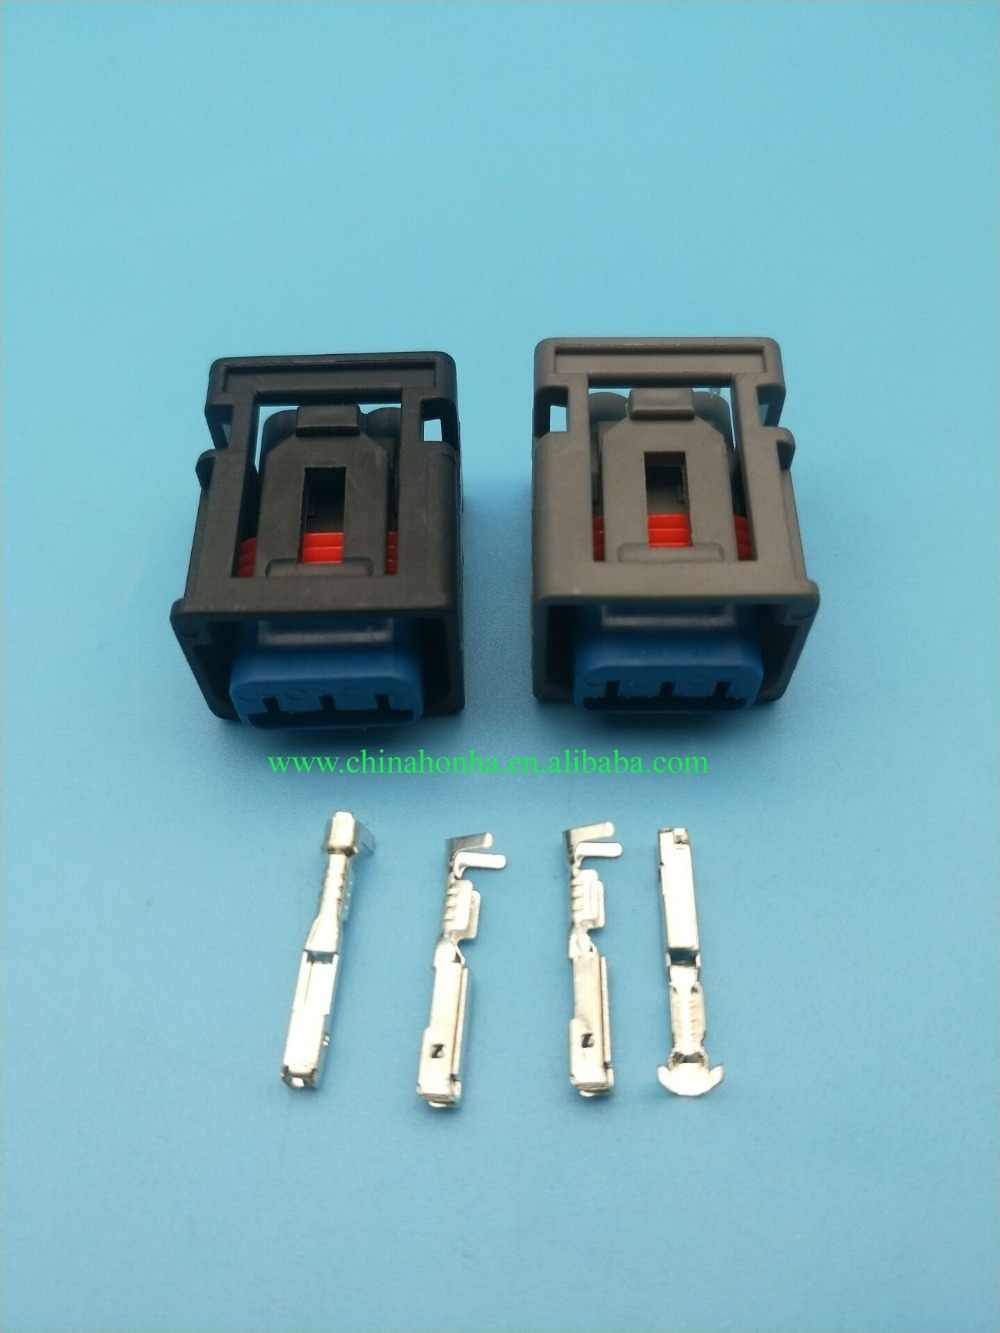 5 pcs 3 Pin/Way Female Ignition Coil Plug Waterproof